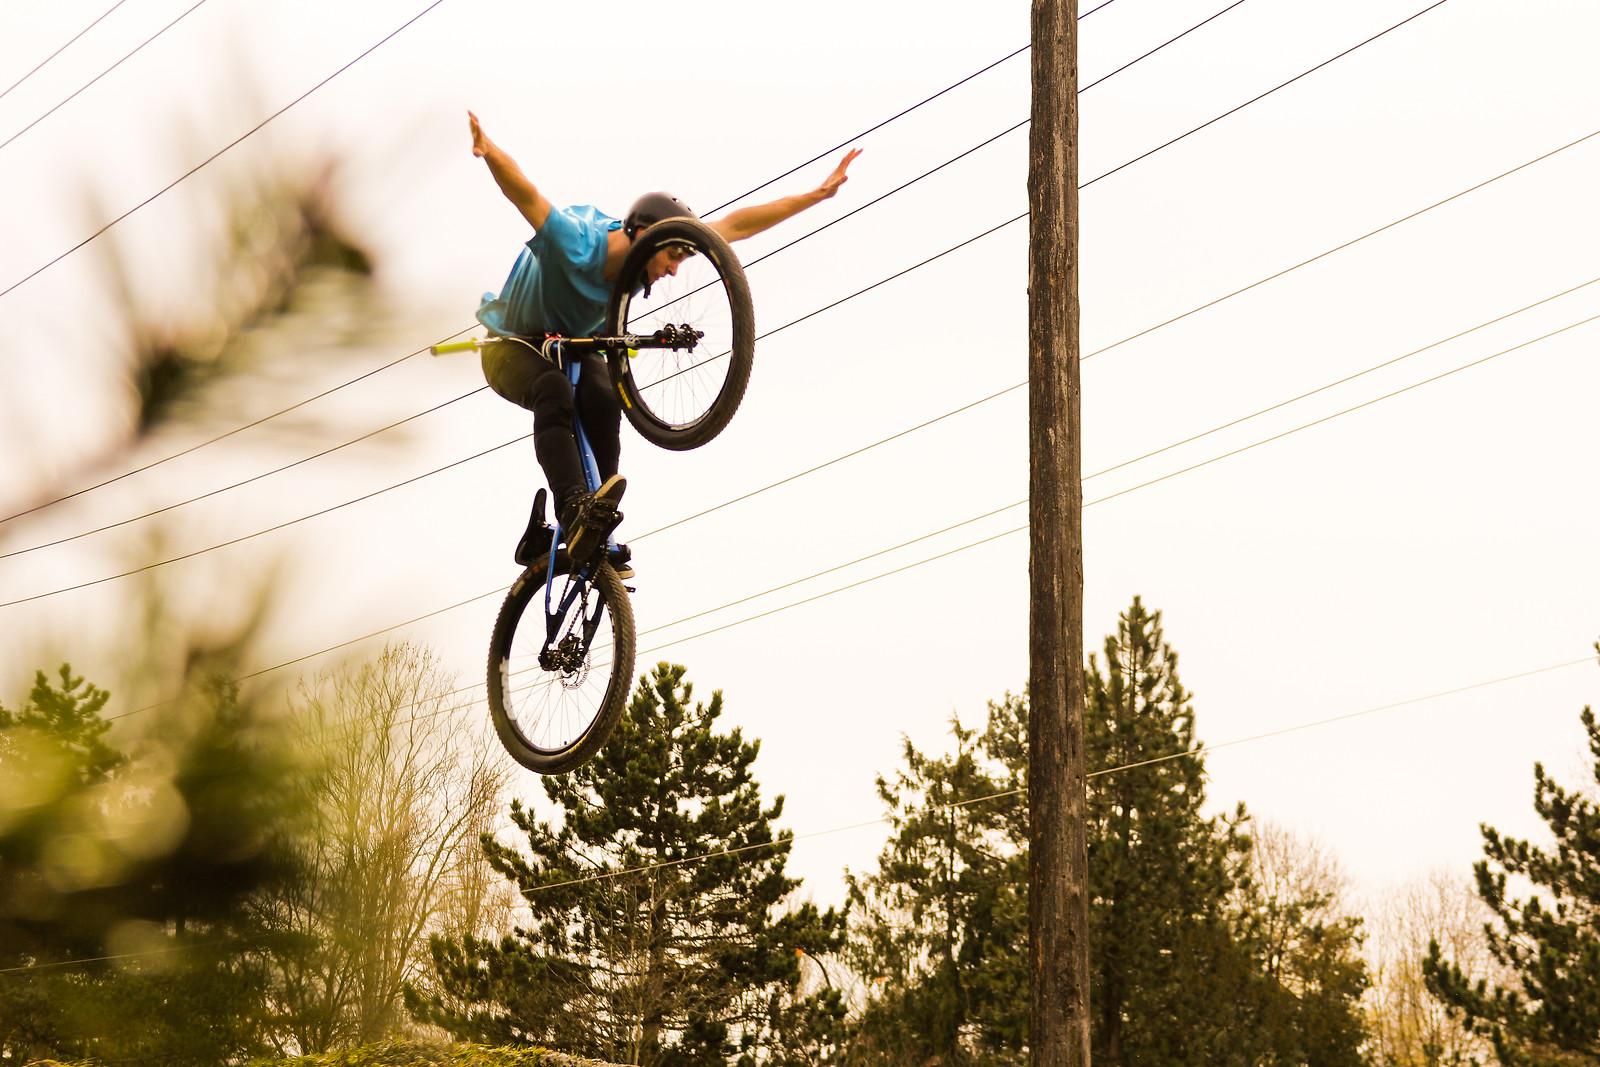 Liam Wallace: Tuck no-hander - KazYamamura - Mountain Biking Pictures - Vital MTB